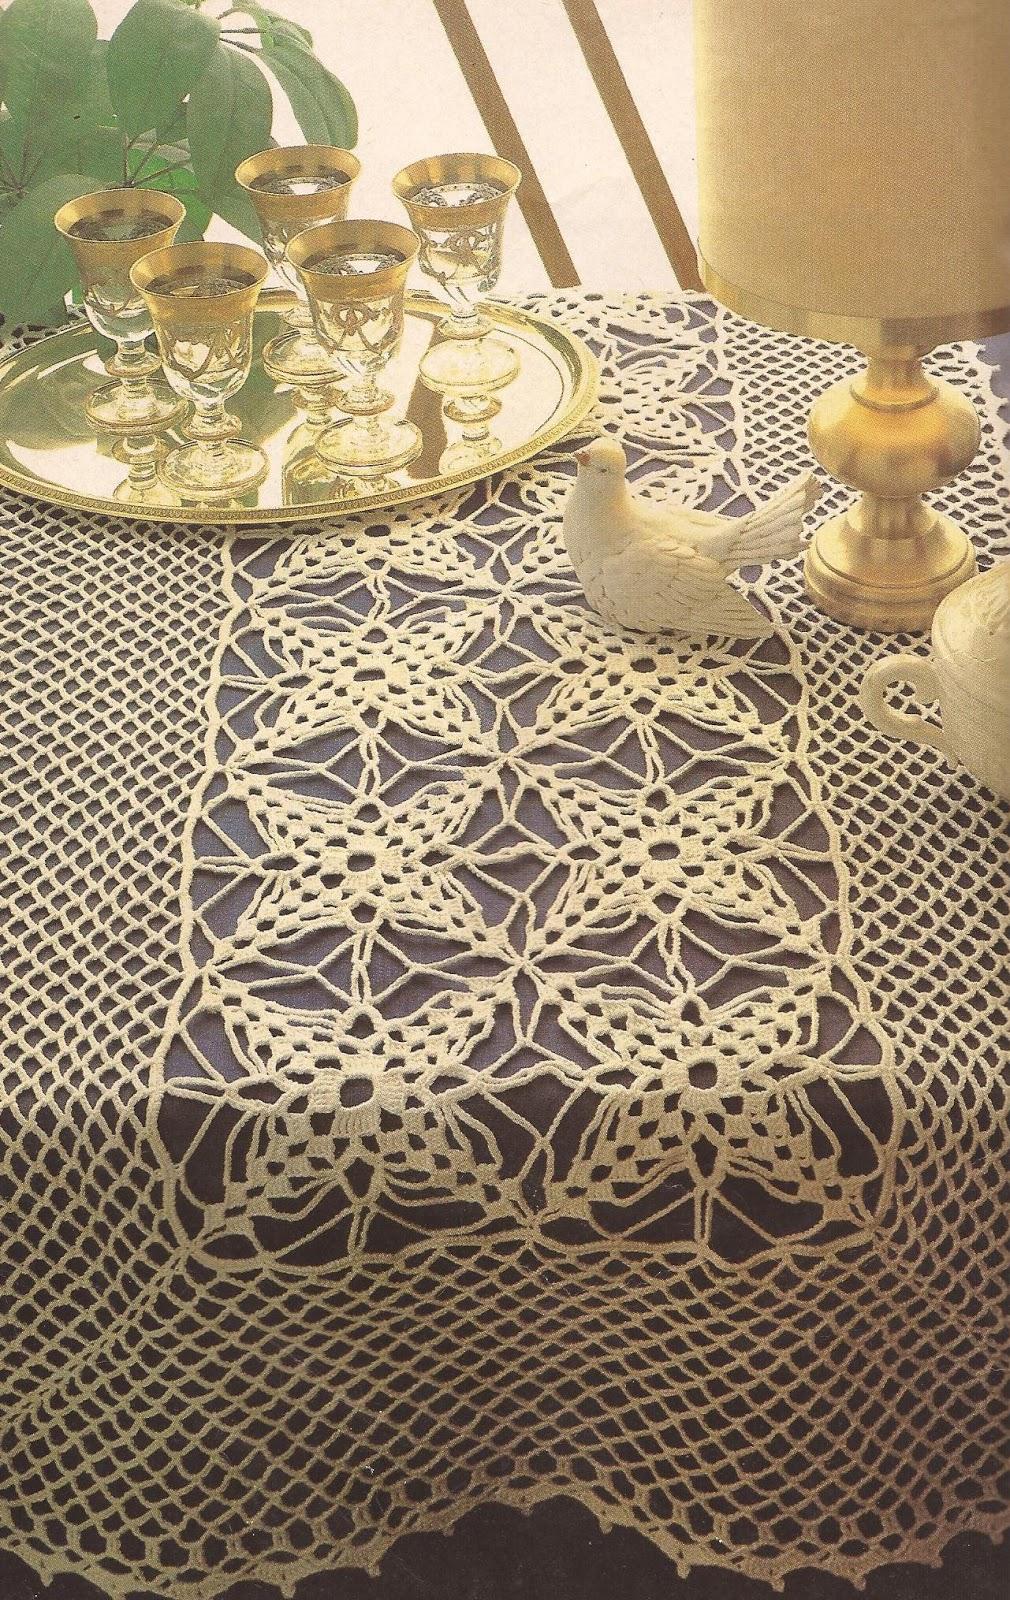 Camino de mesa a crochet esquemas - Camino de mesa elegante en crochet ...